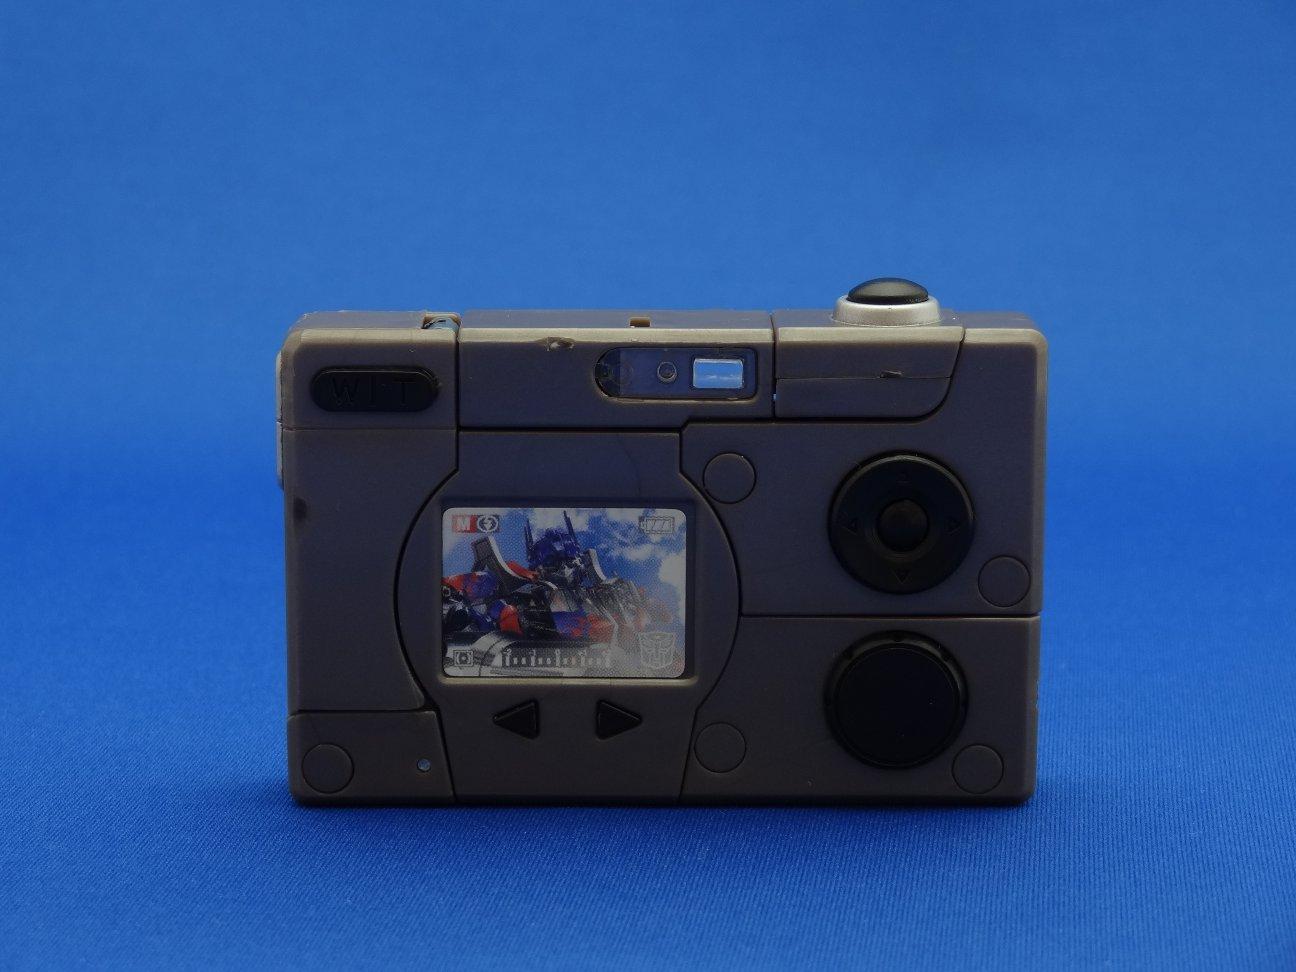 Dsc02661.jpg